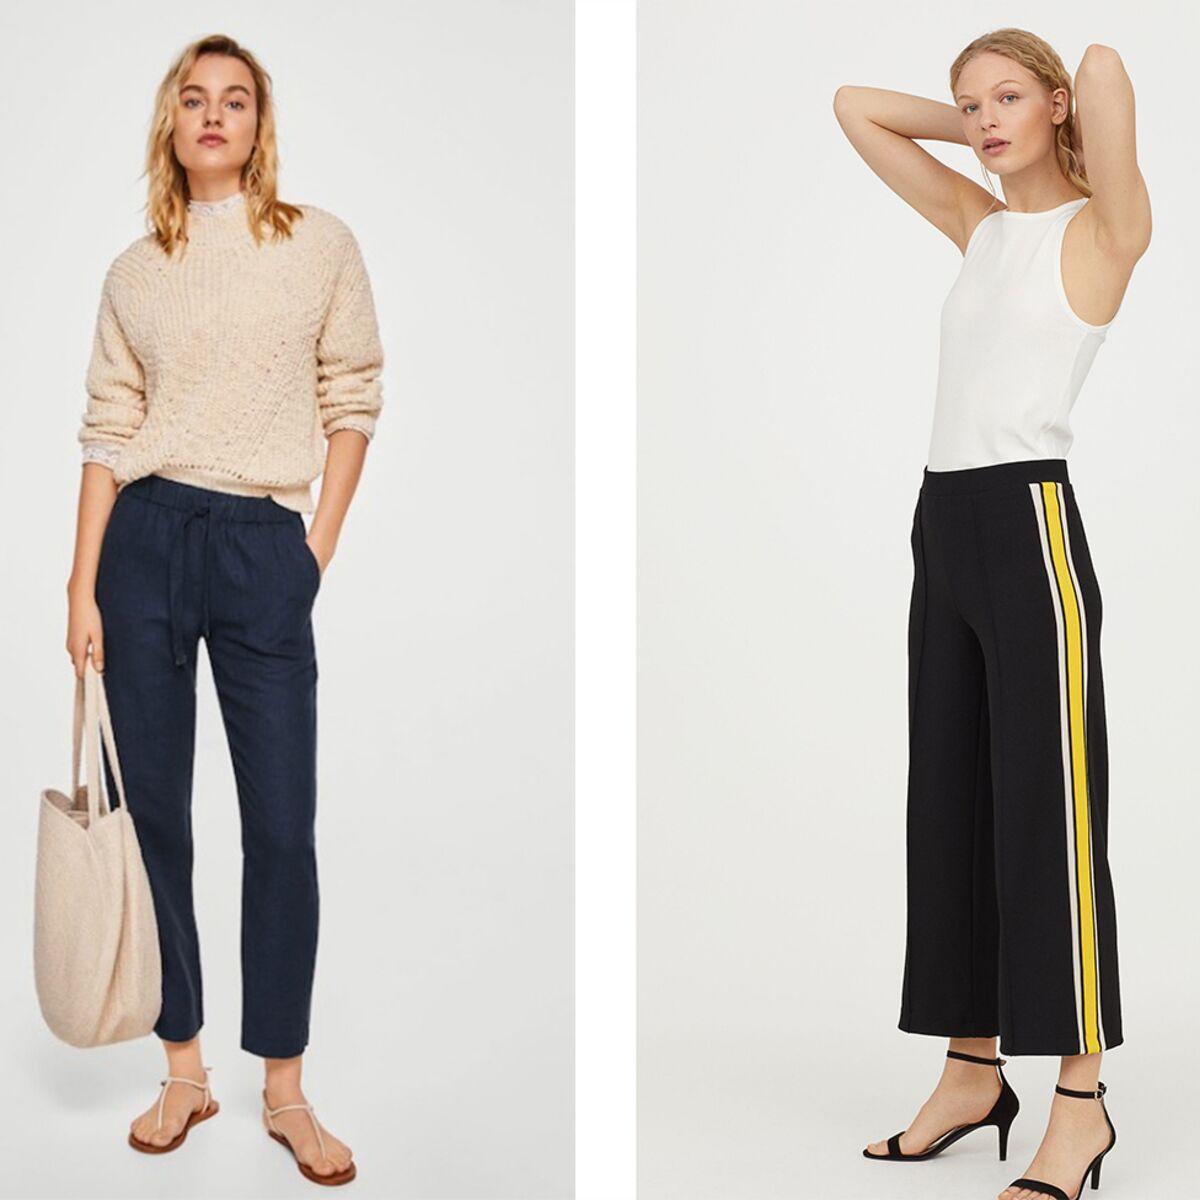 pantalon femme tendance